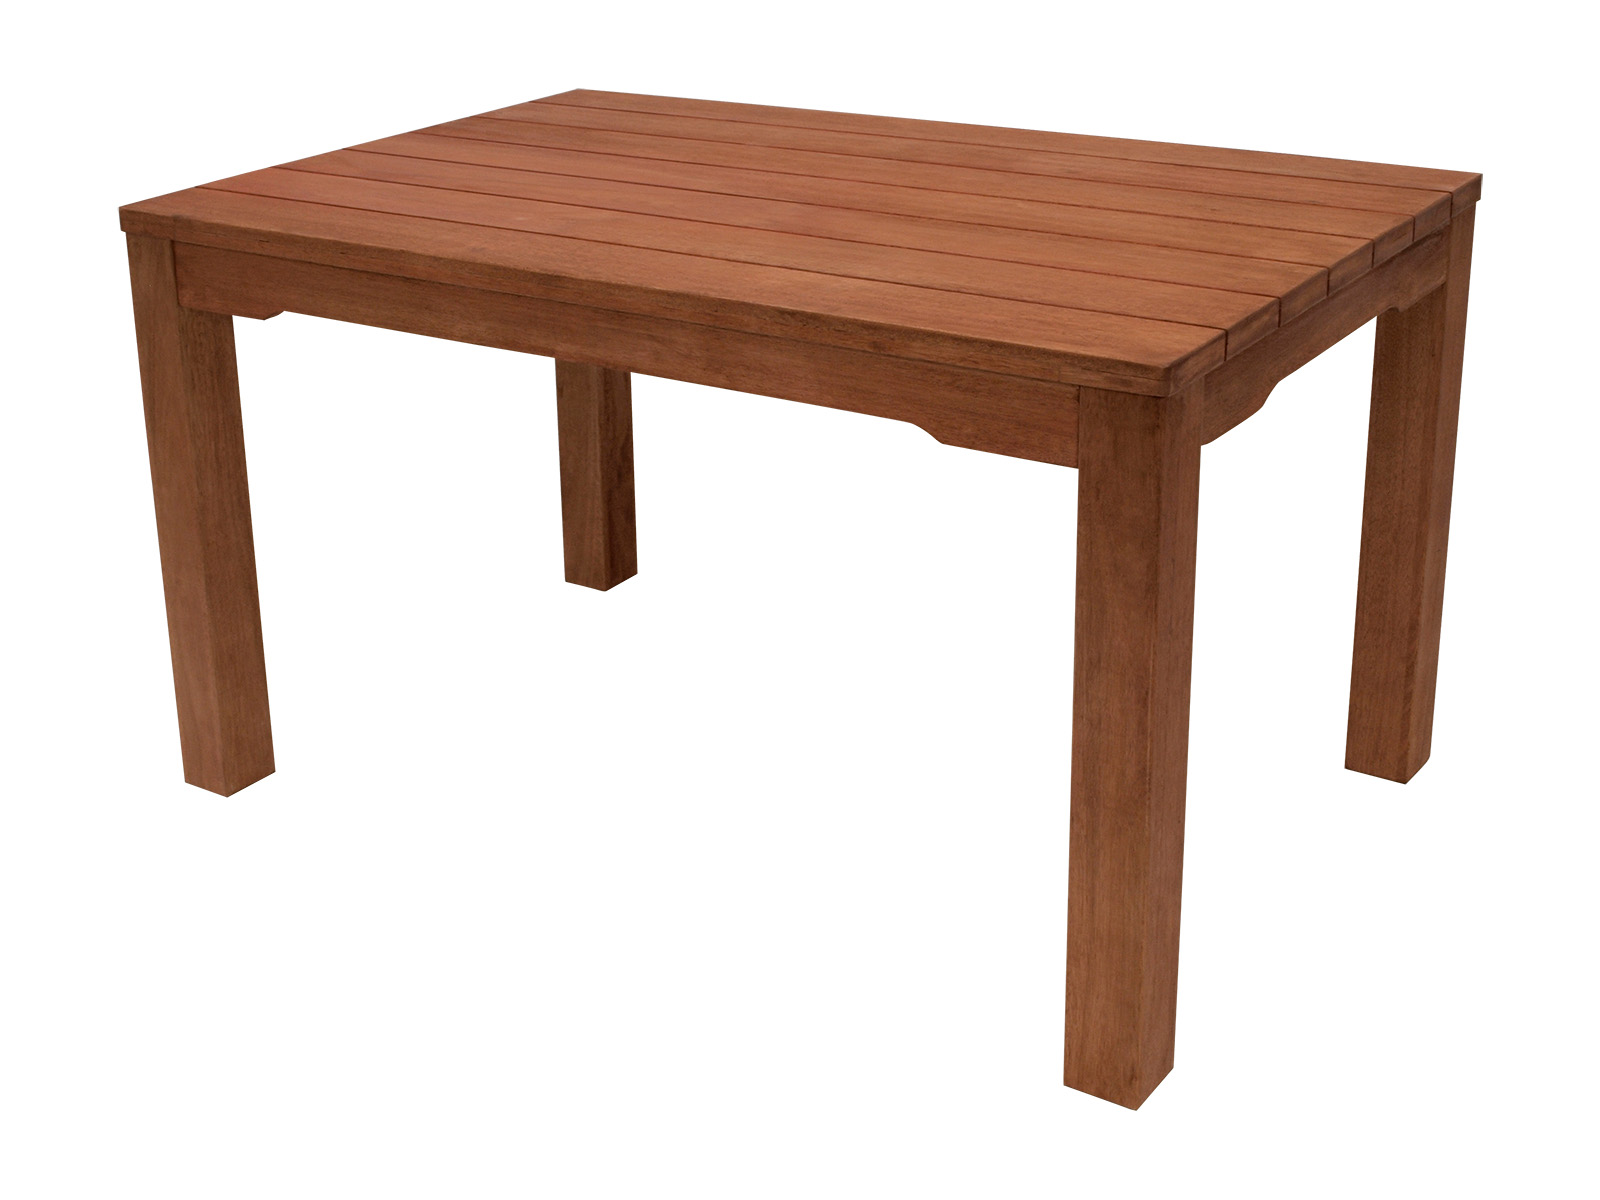 gartentisch newport 130x80cm antiklook schwere ausf hrung eukalyptus 2 wahl ebay. Black Bedroom Furniture Sets. Home Design Ideas